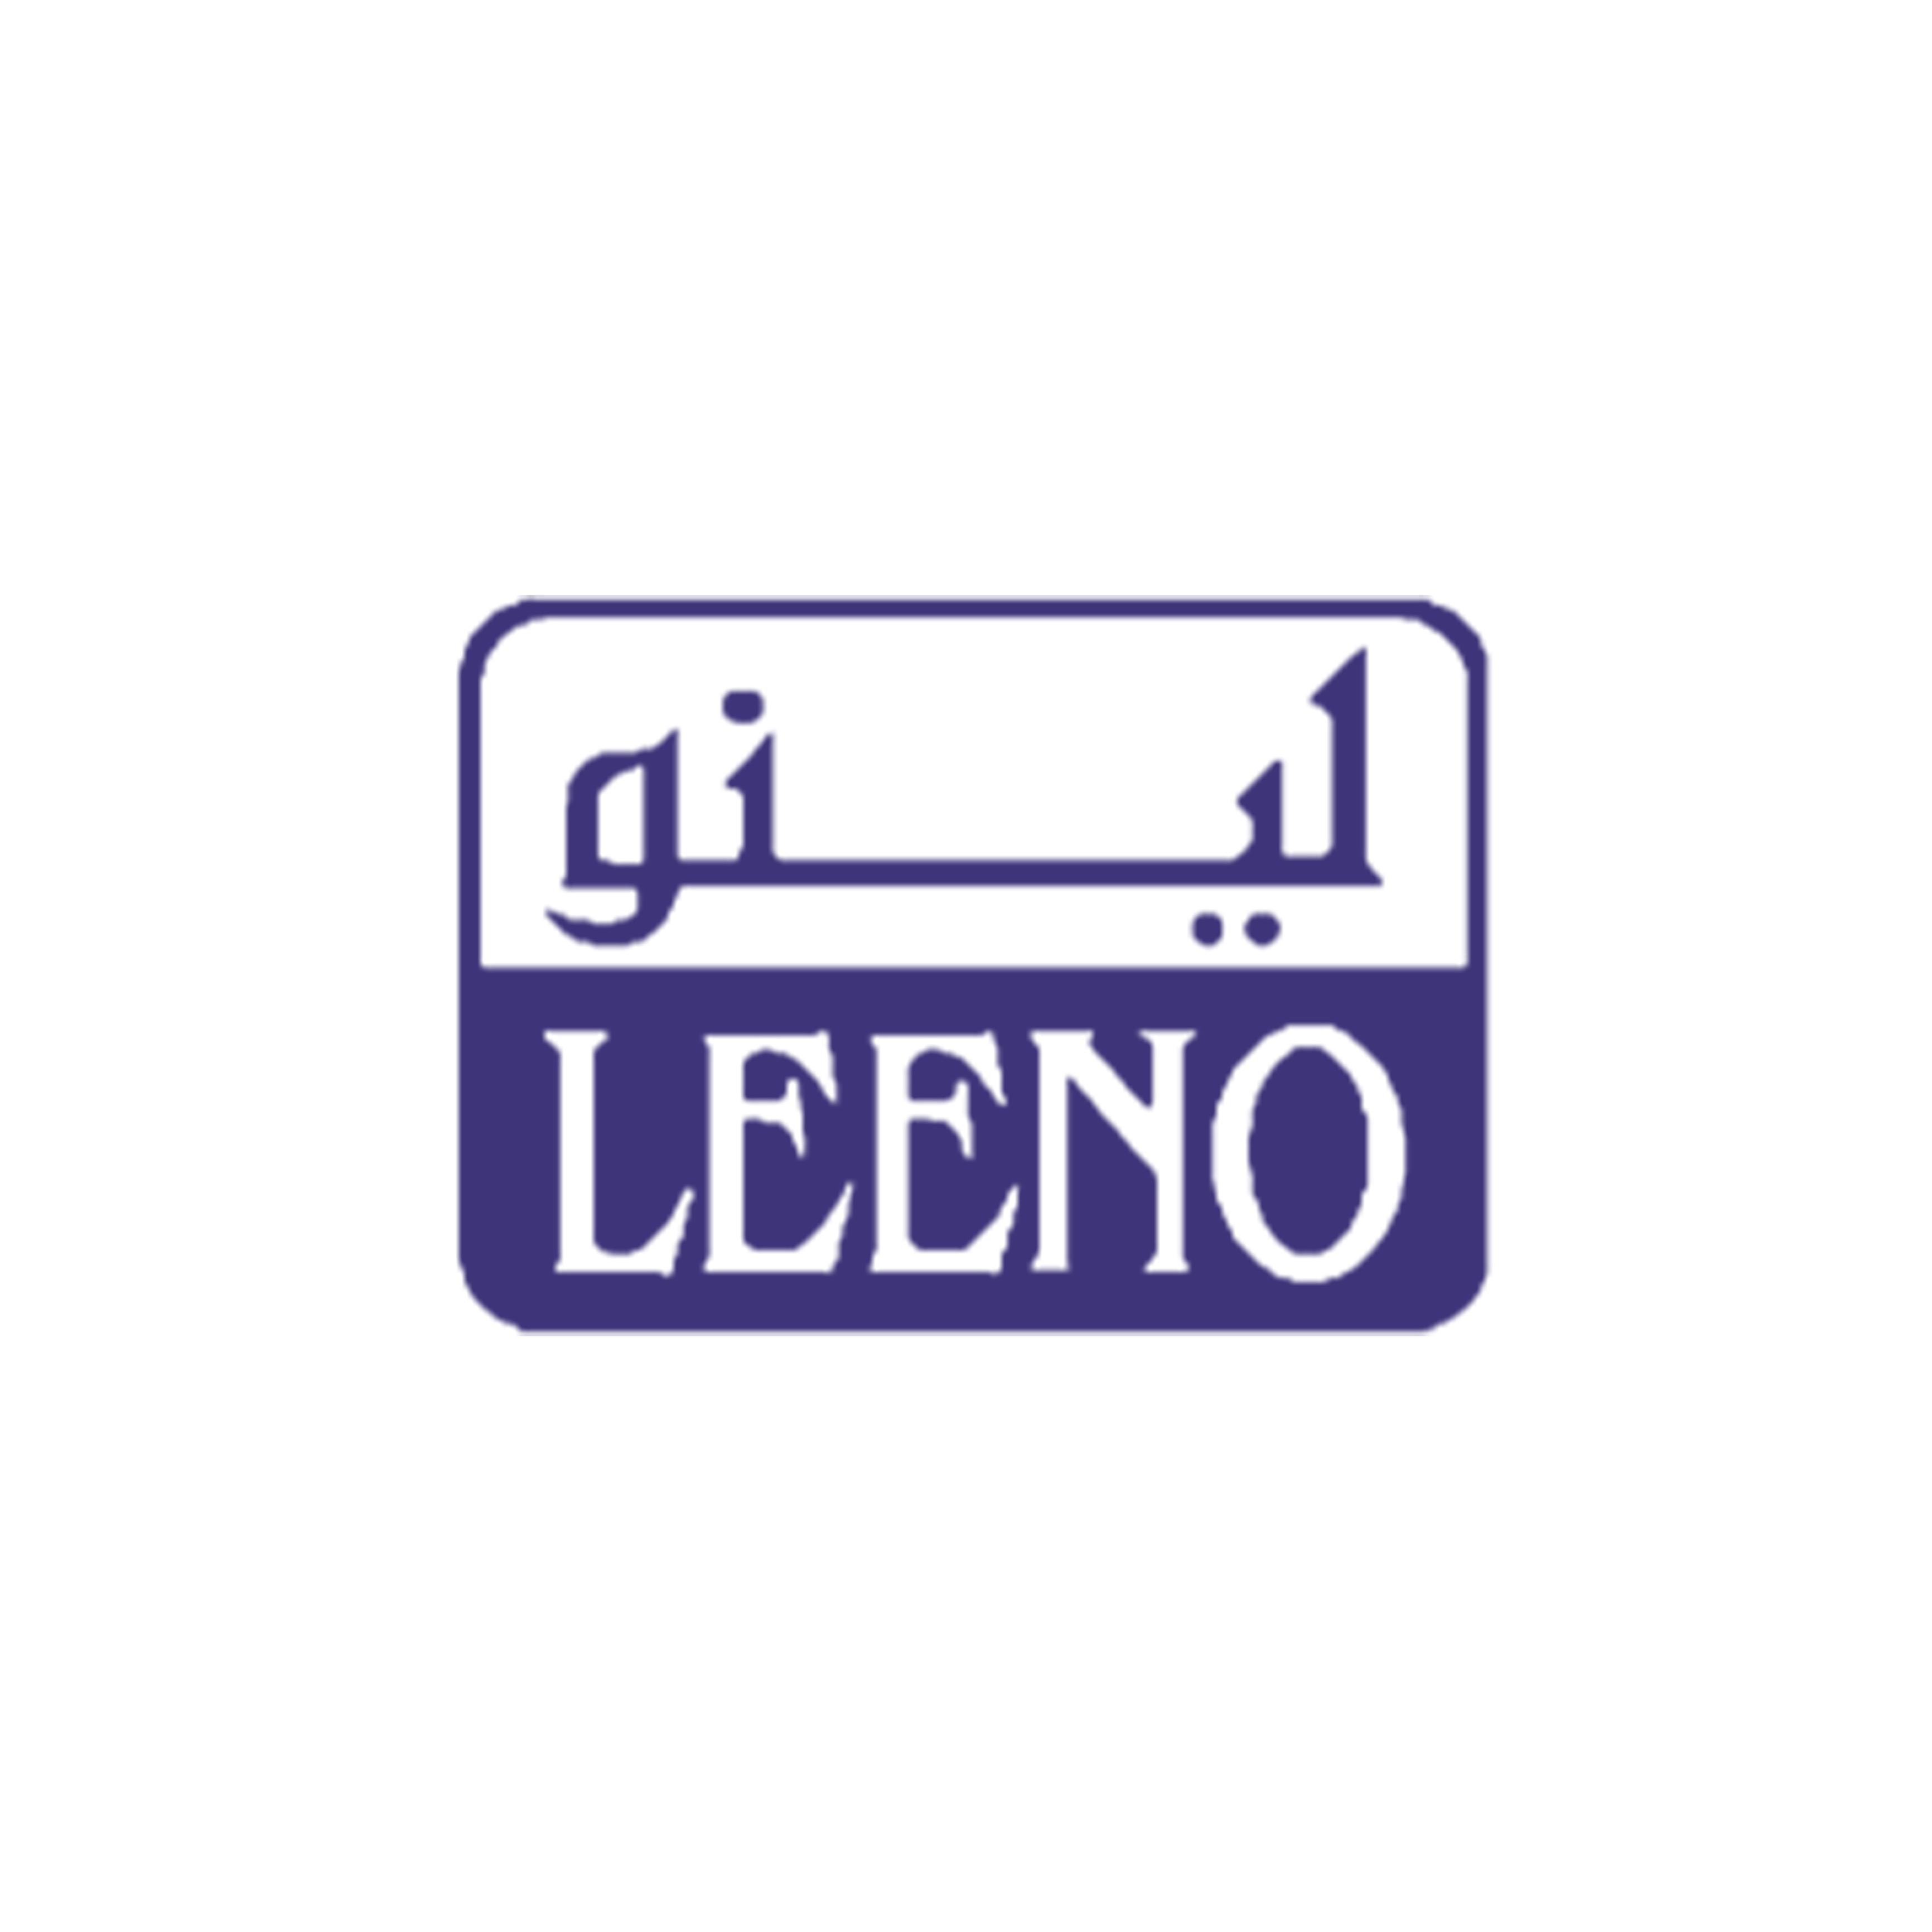 LEENO